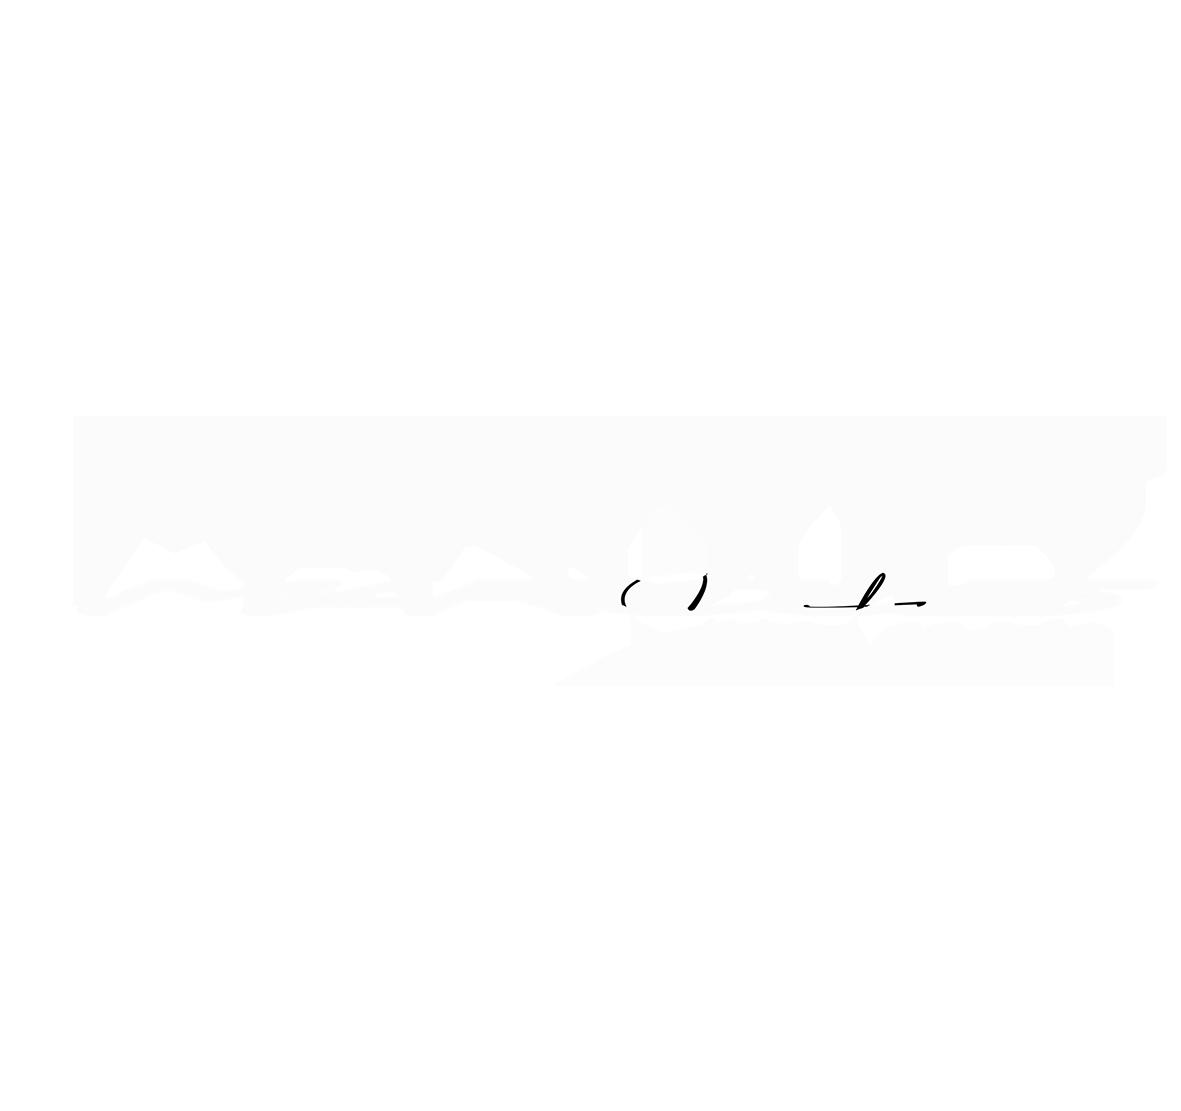 www.marcussport.com